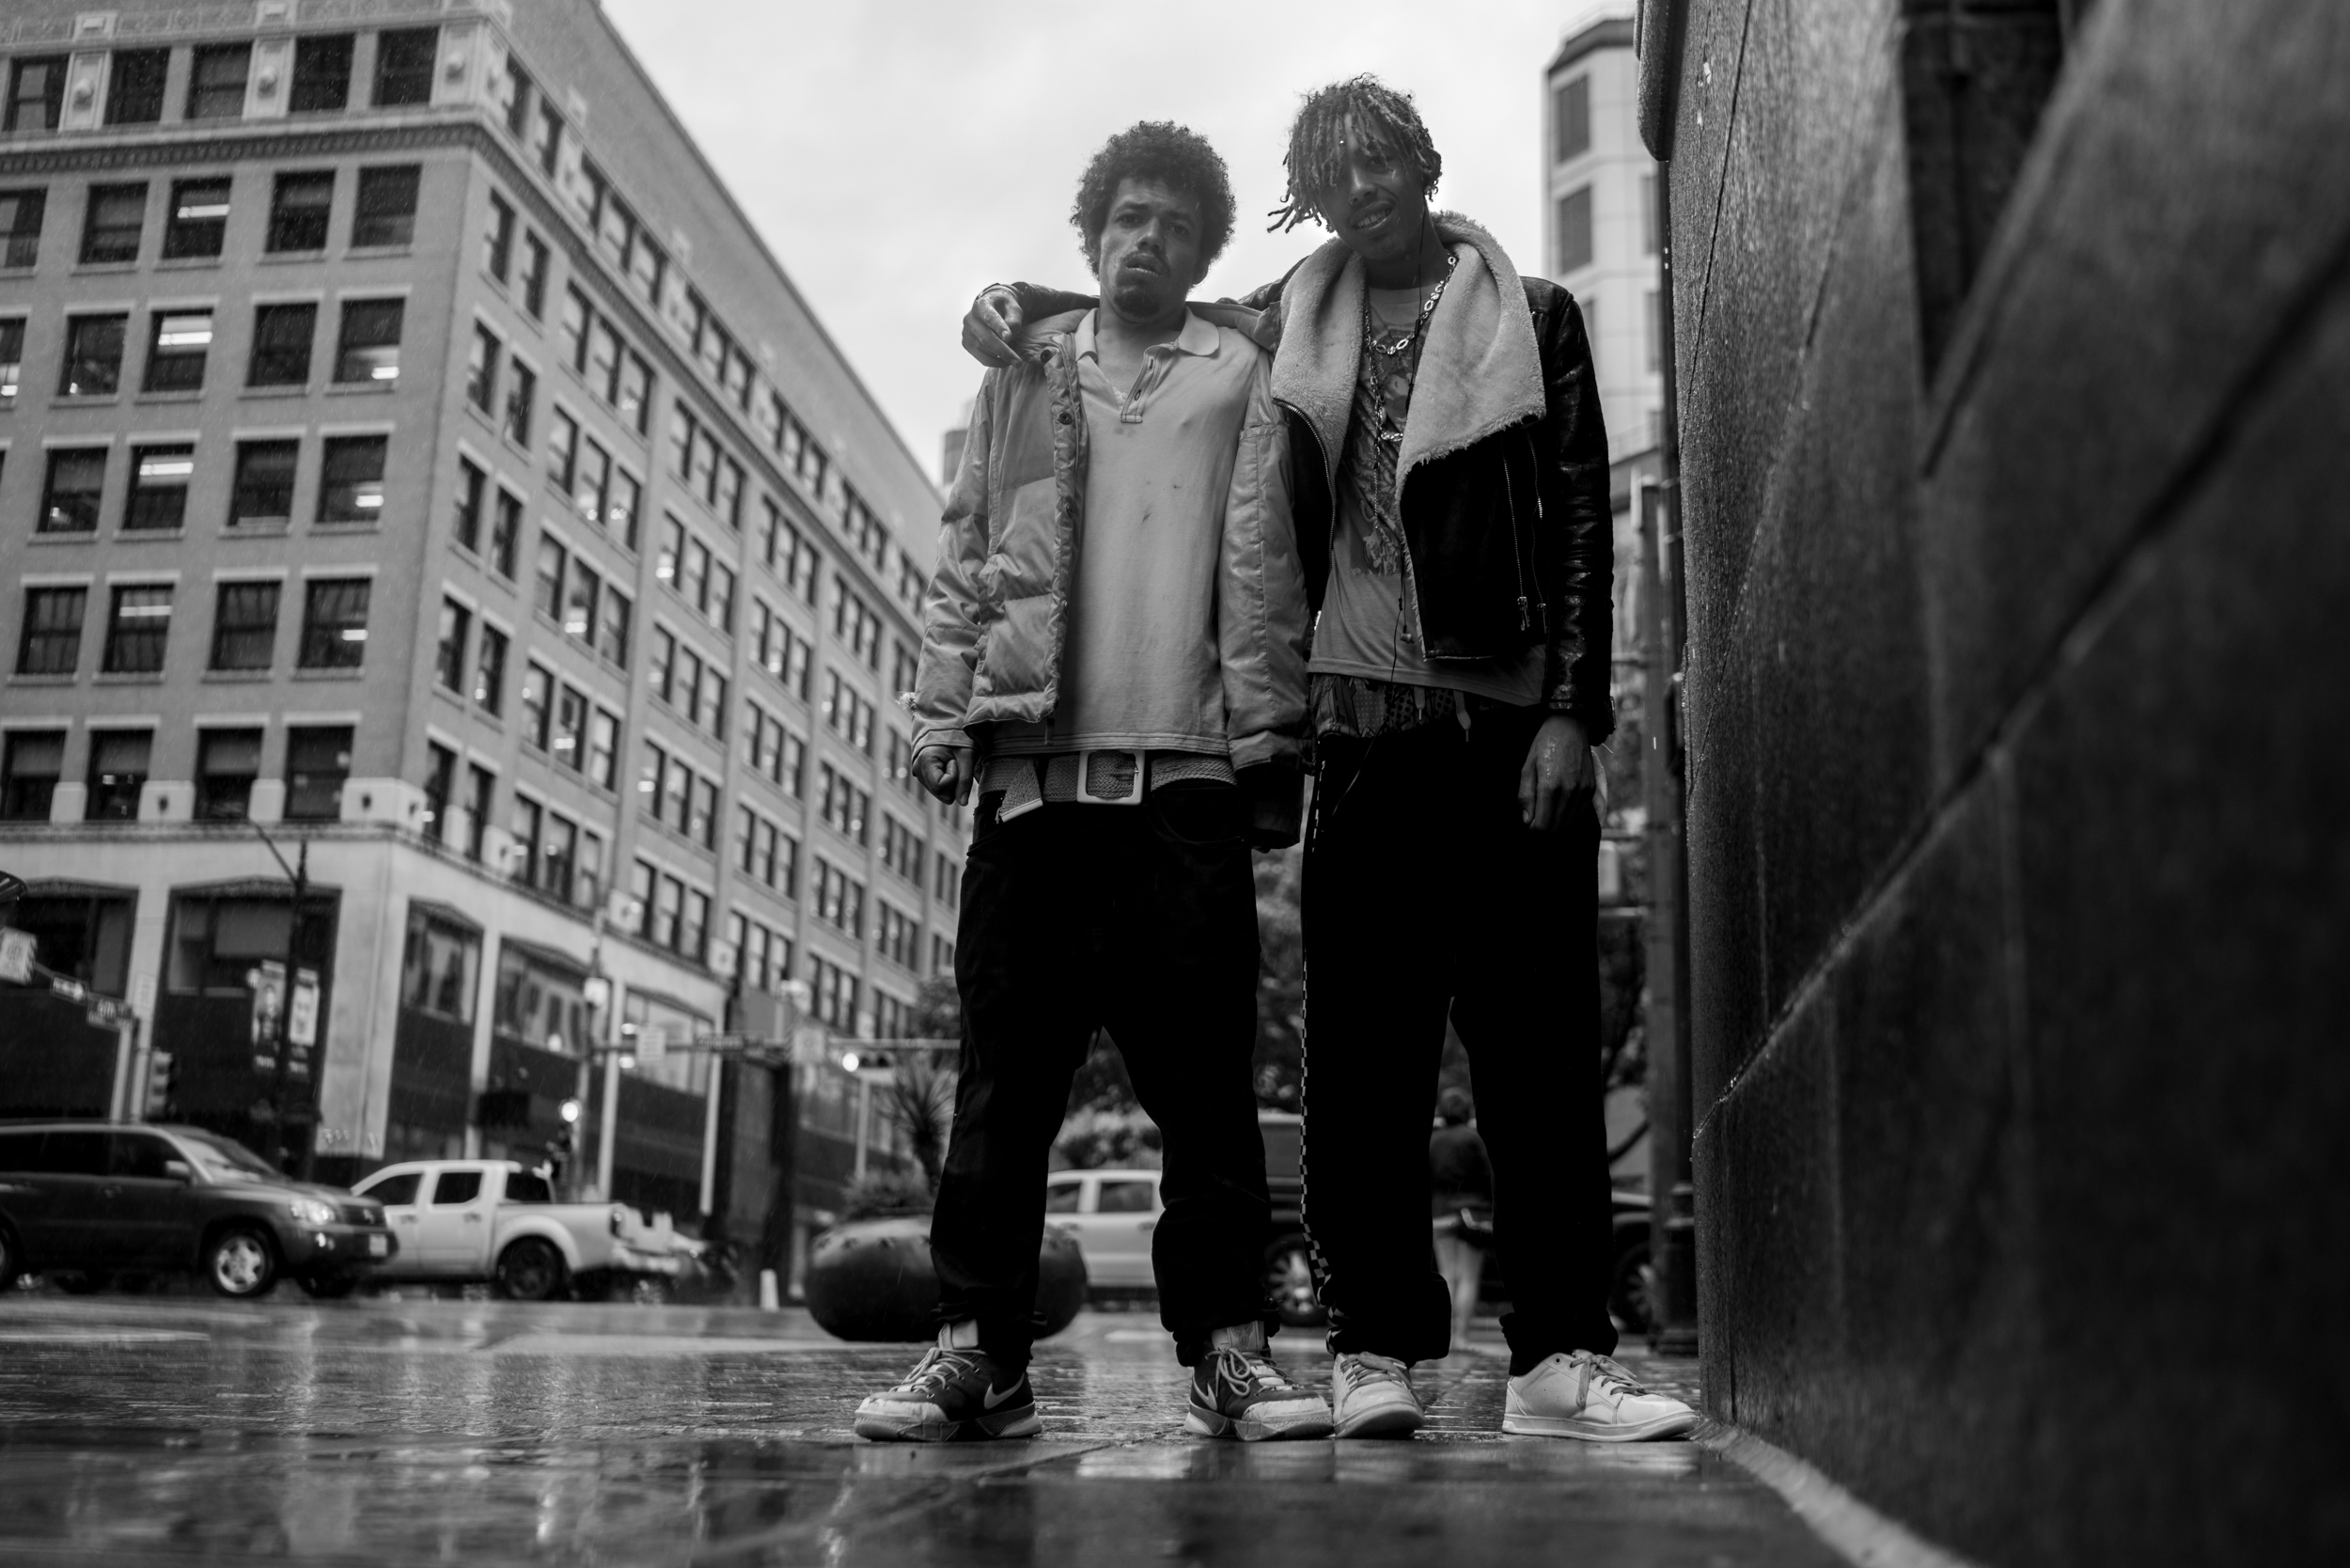 joevanwyk_streetphotography_austin_6thstreet_05-2019-149.jpg